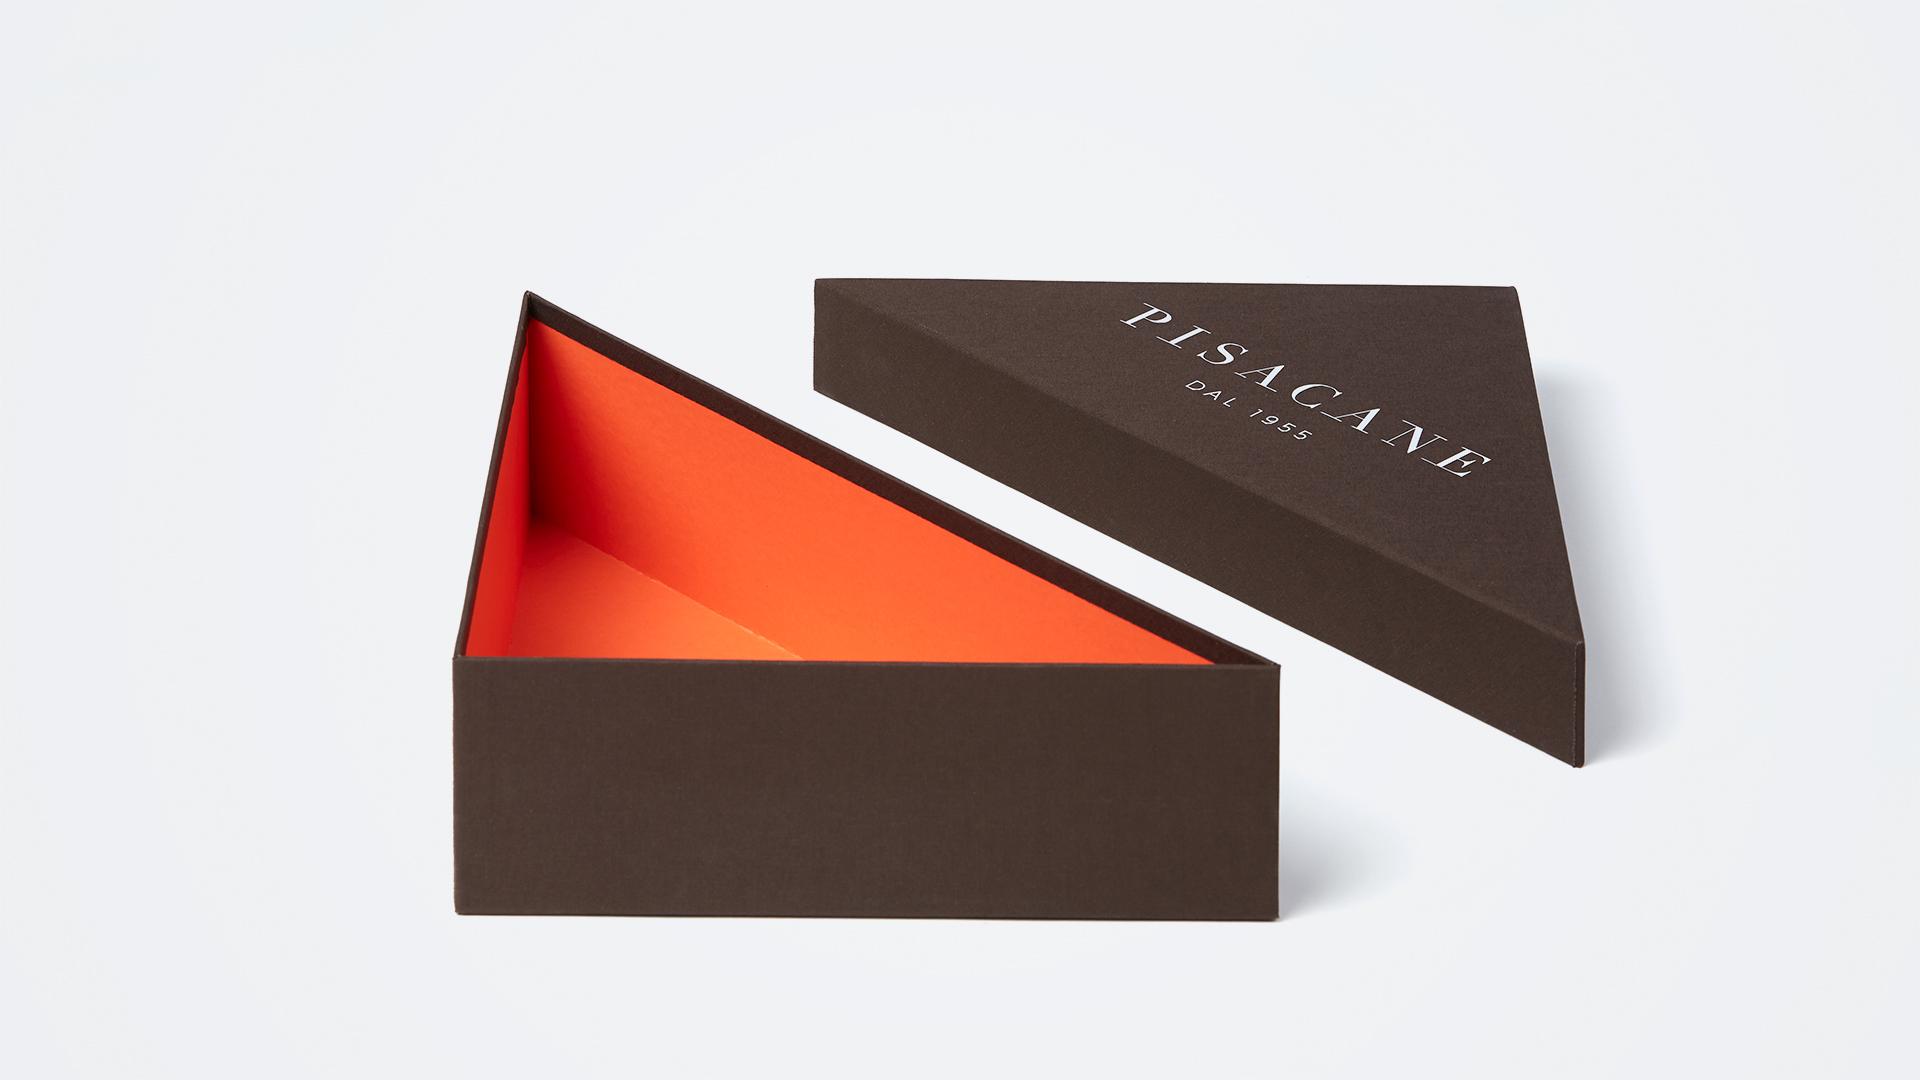 scatola triangolare in tela e logo metallico